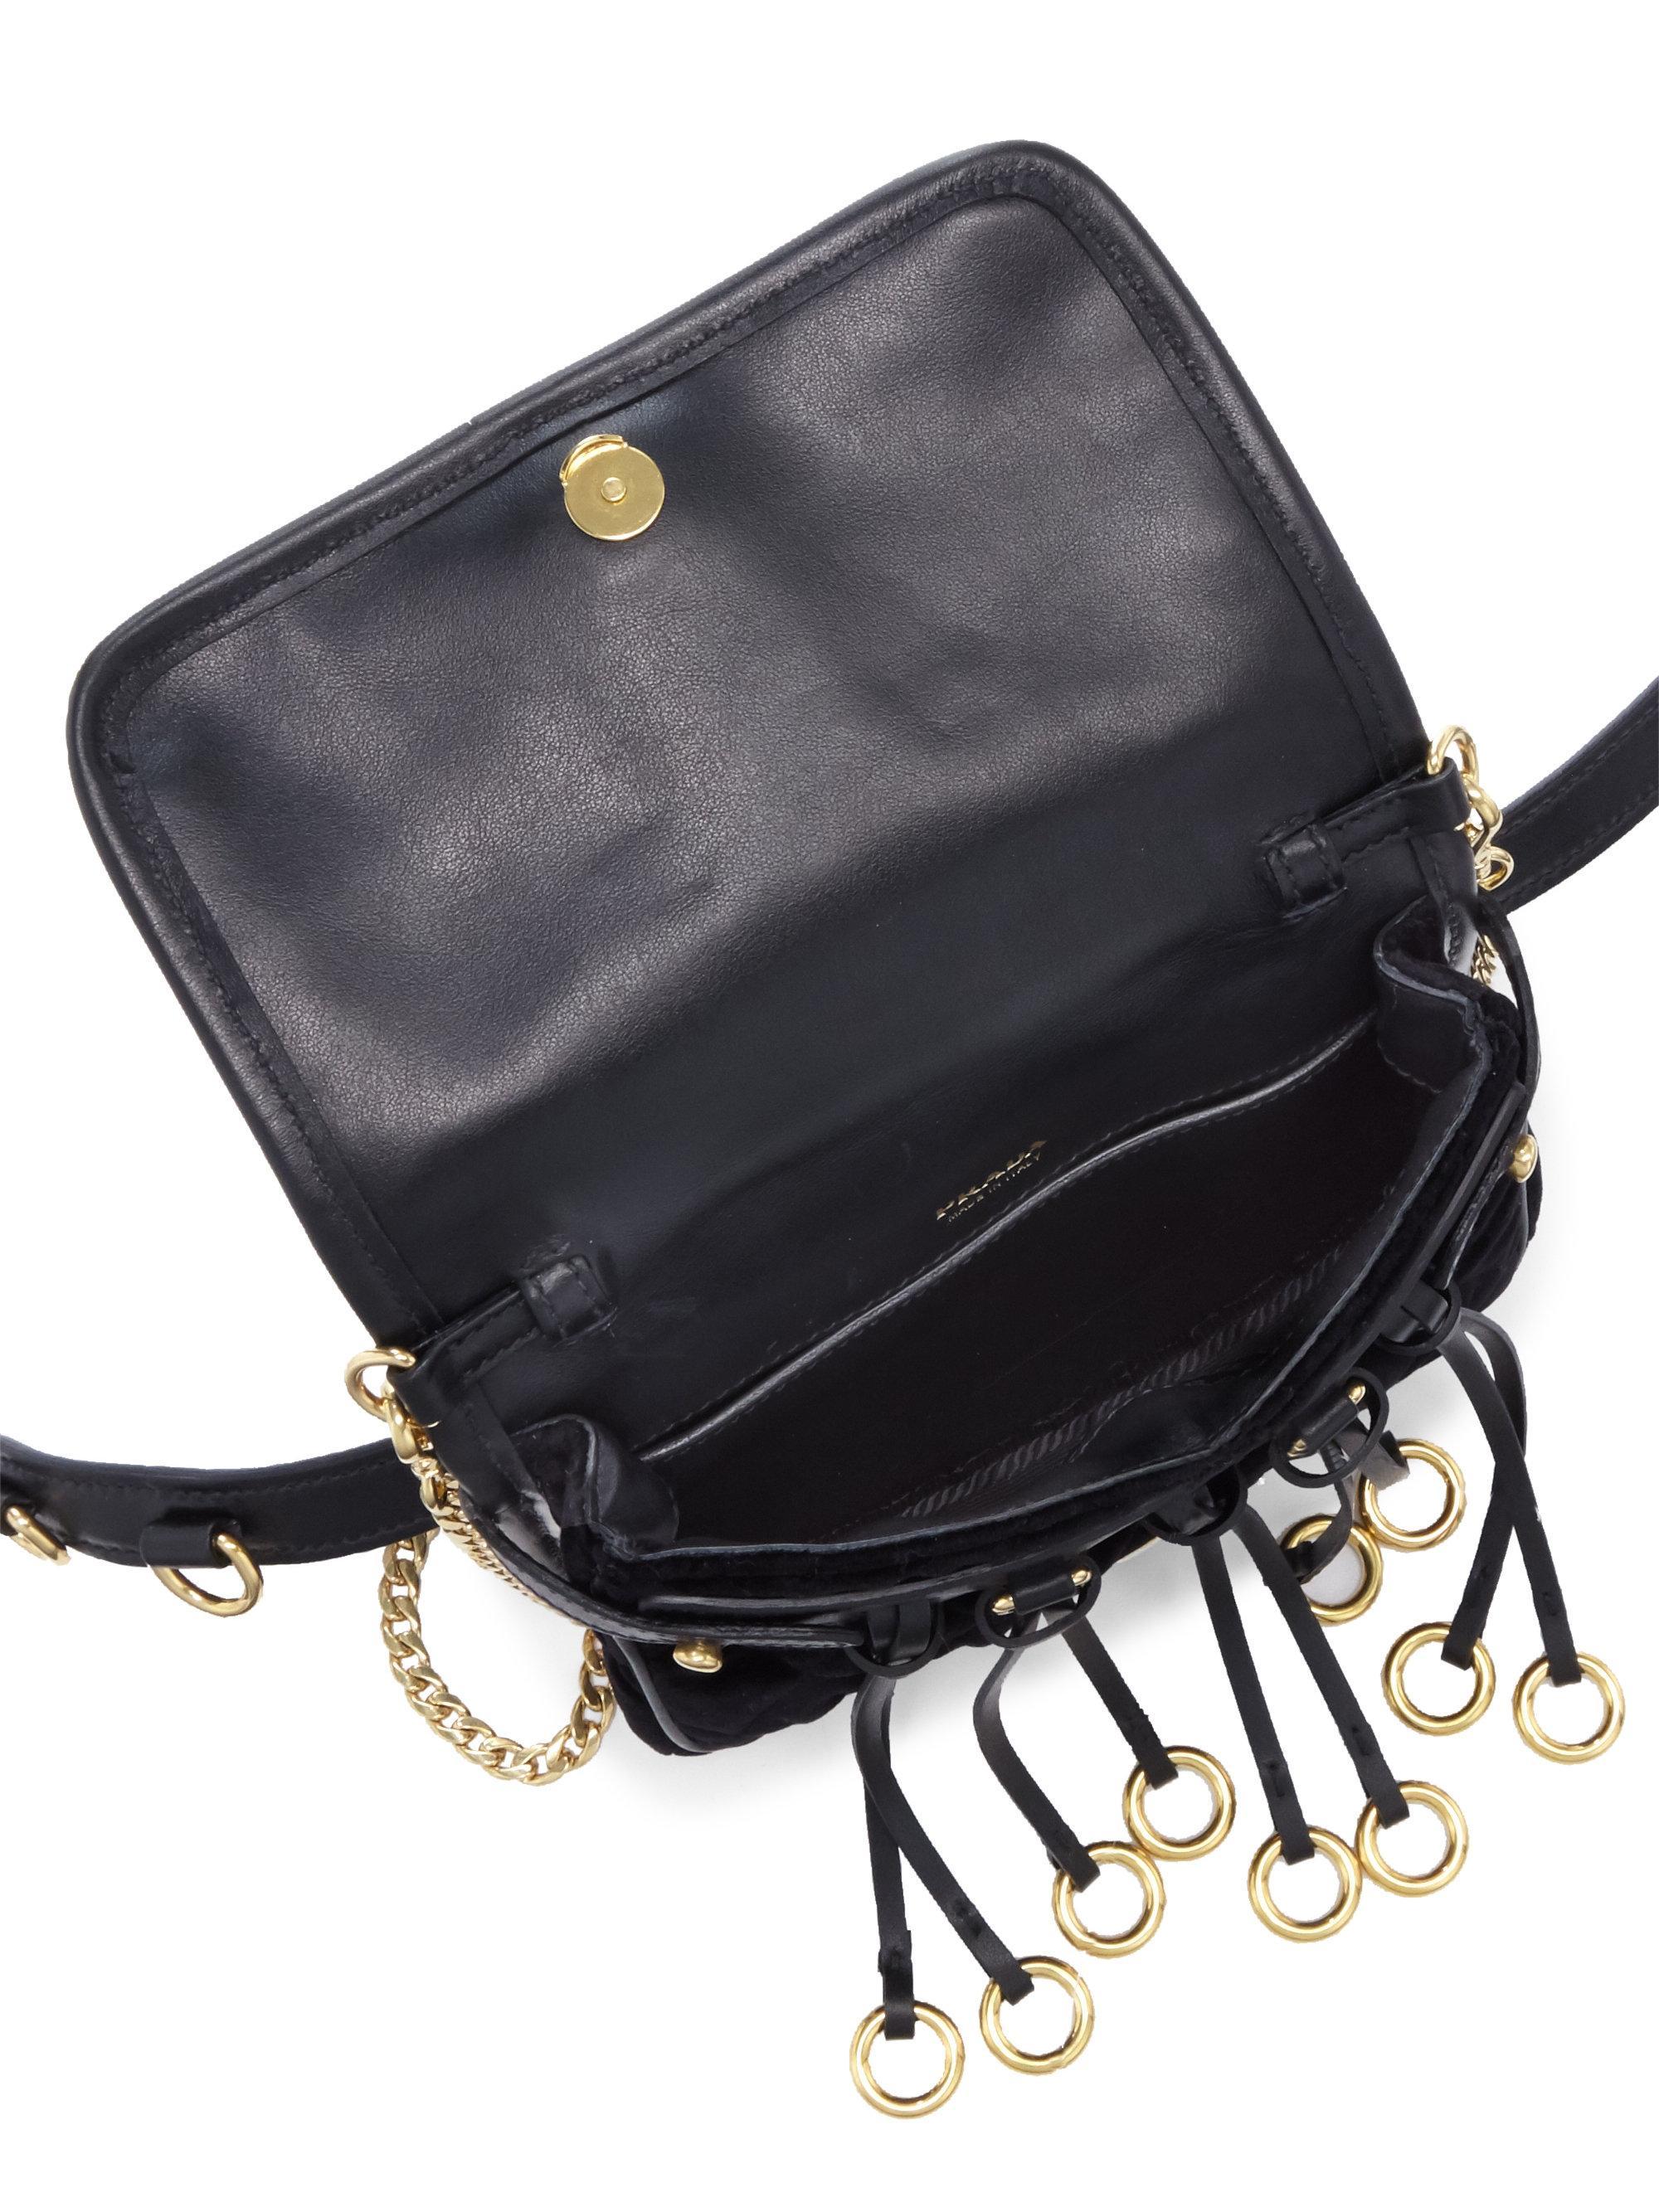 b8e6dfaf3da0 Prada Floral-embroidered Velvet Belt Bag in Black - Lyst